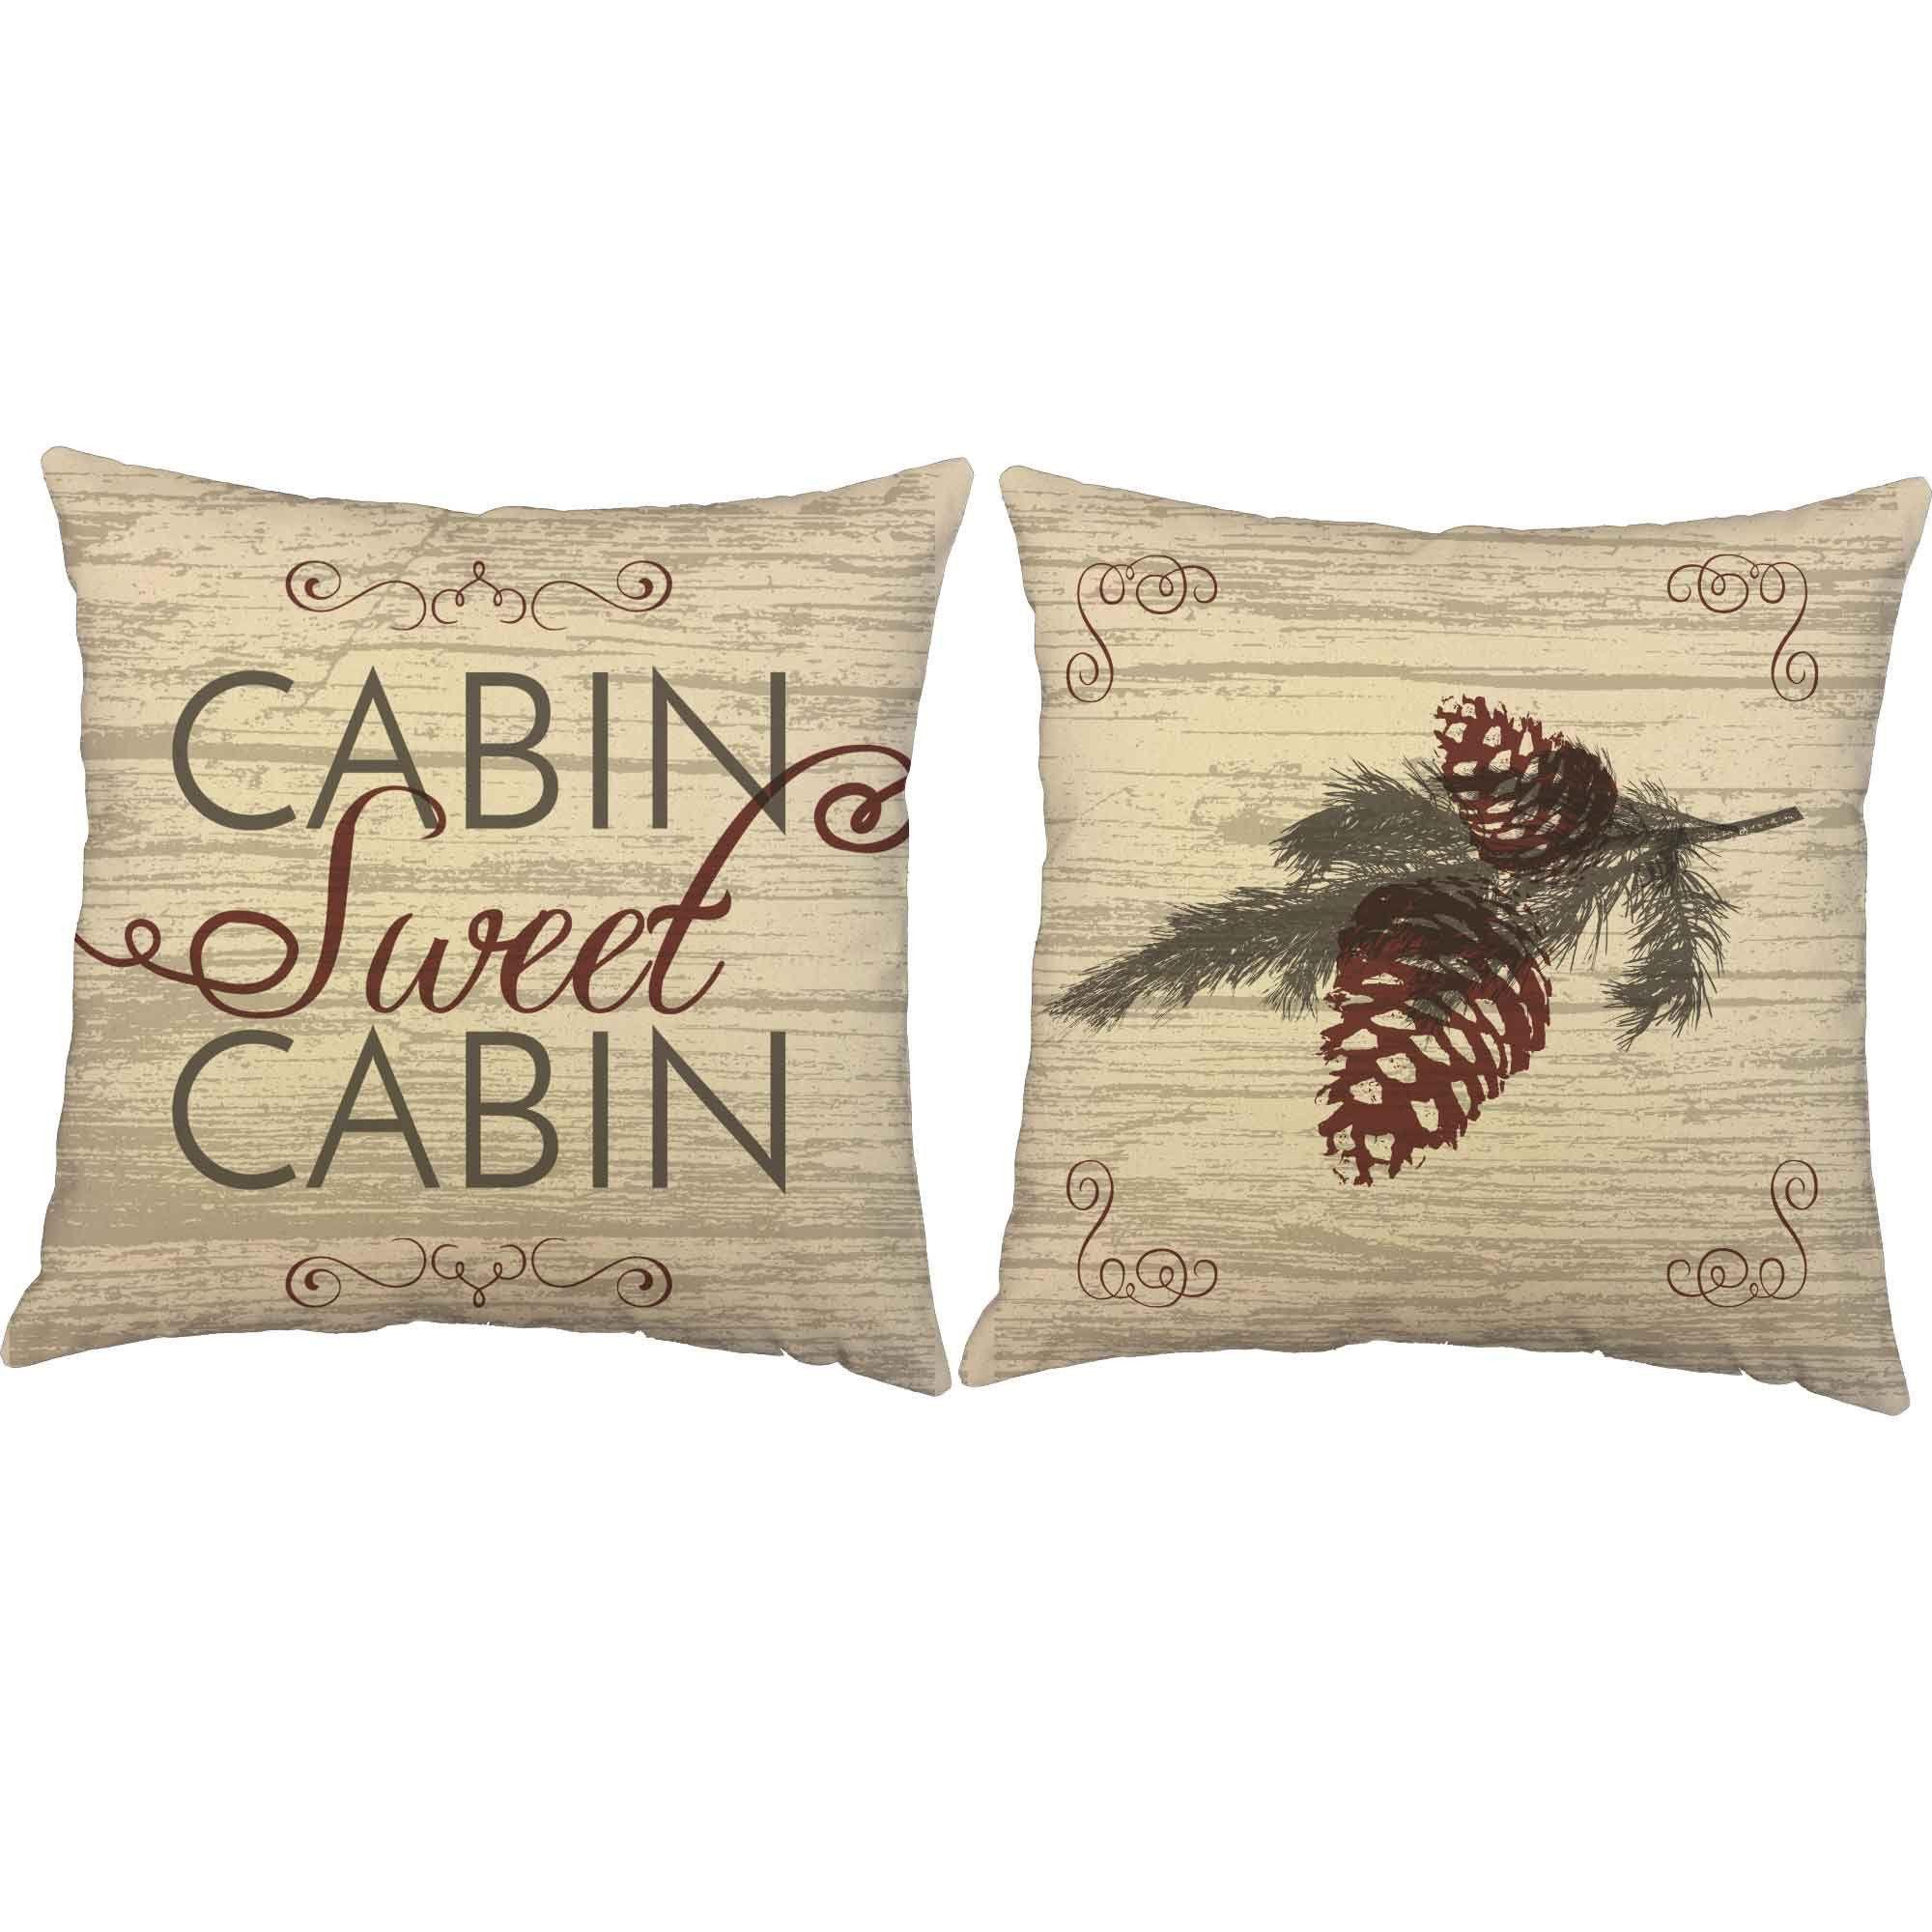 Cabin Sweet Cabin Throw Pillows - Set of 2